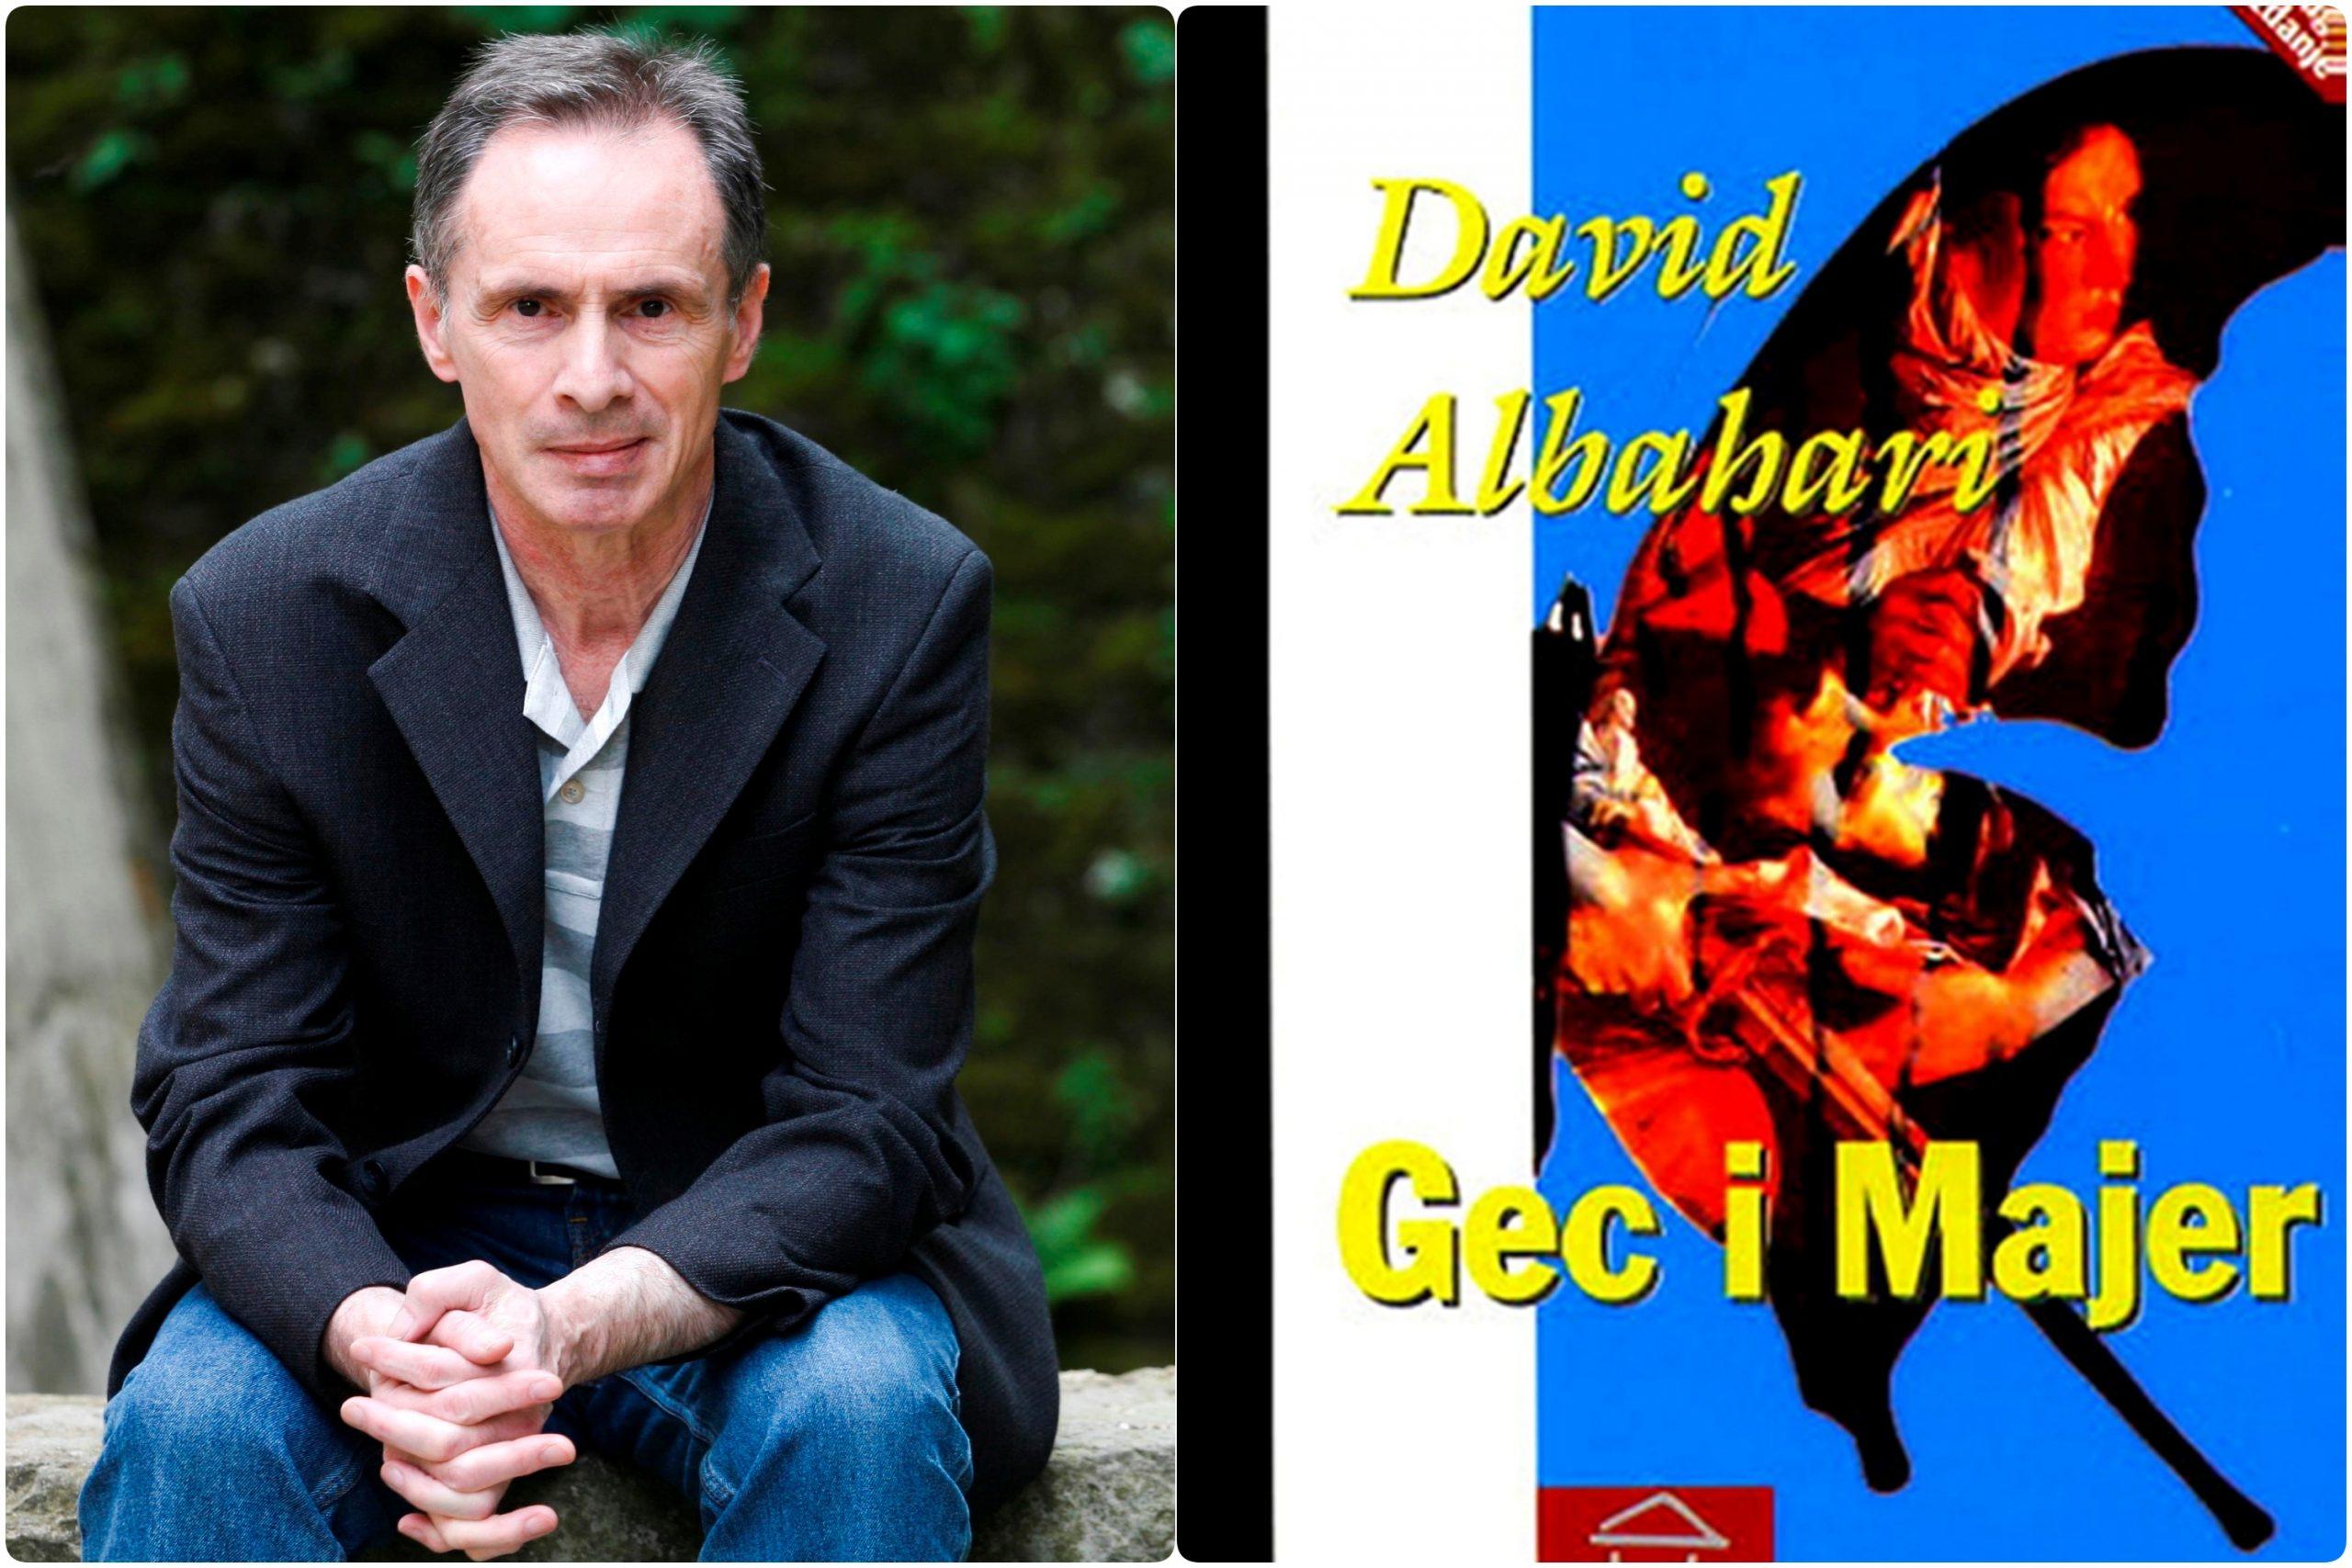 David Albahari Gec i Majer